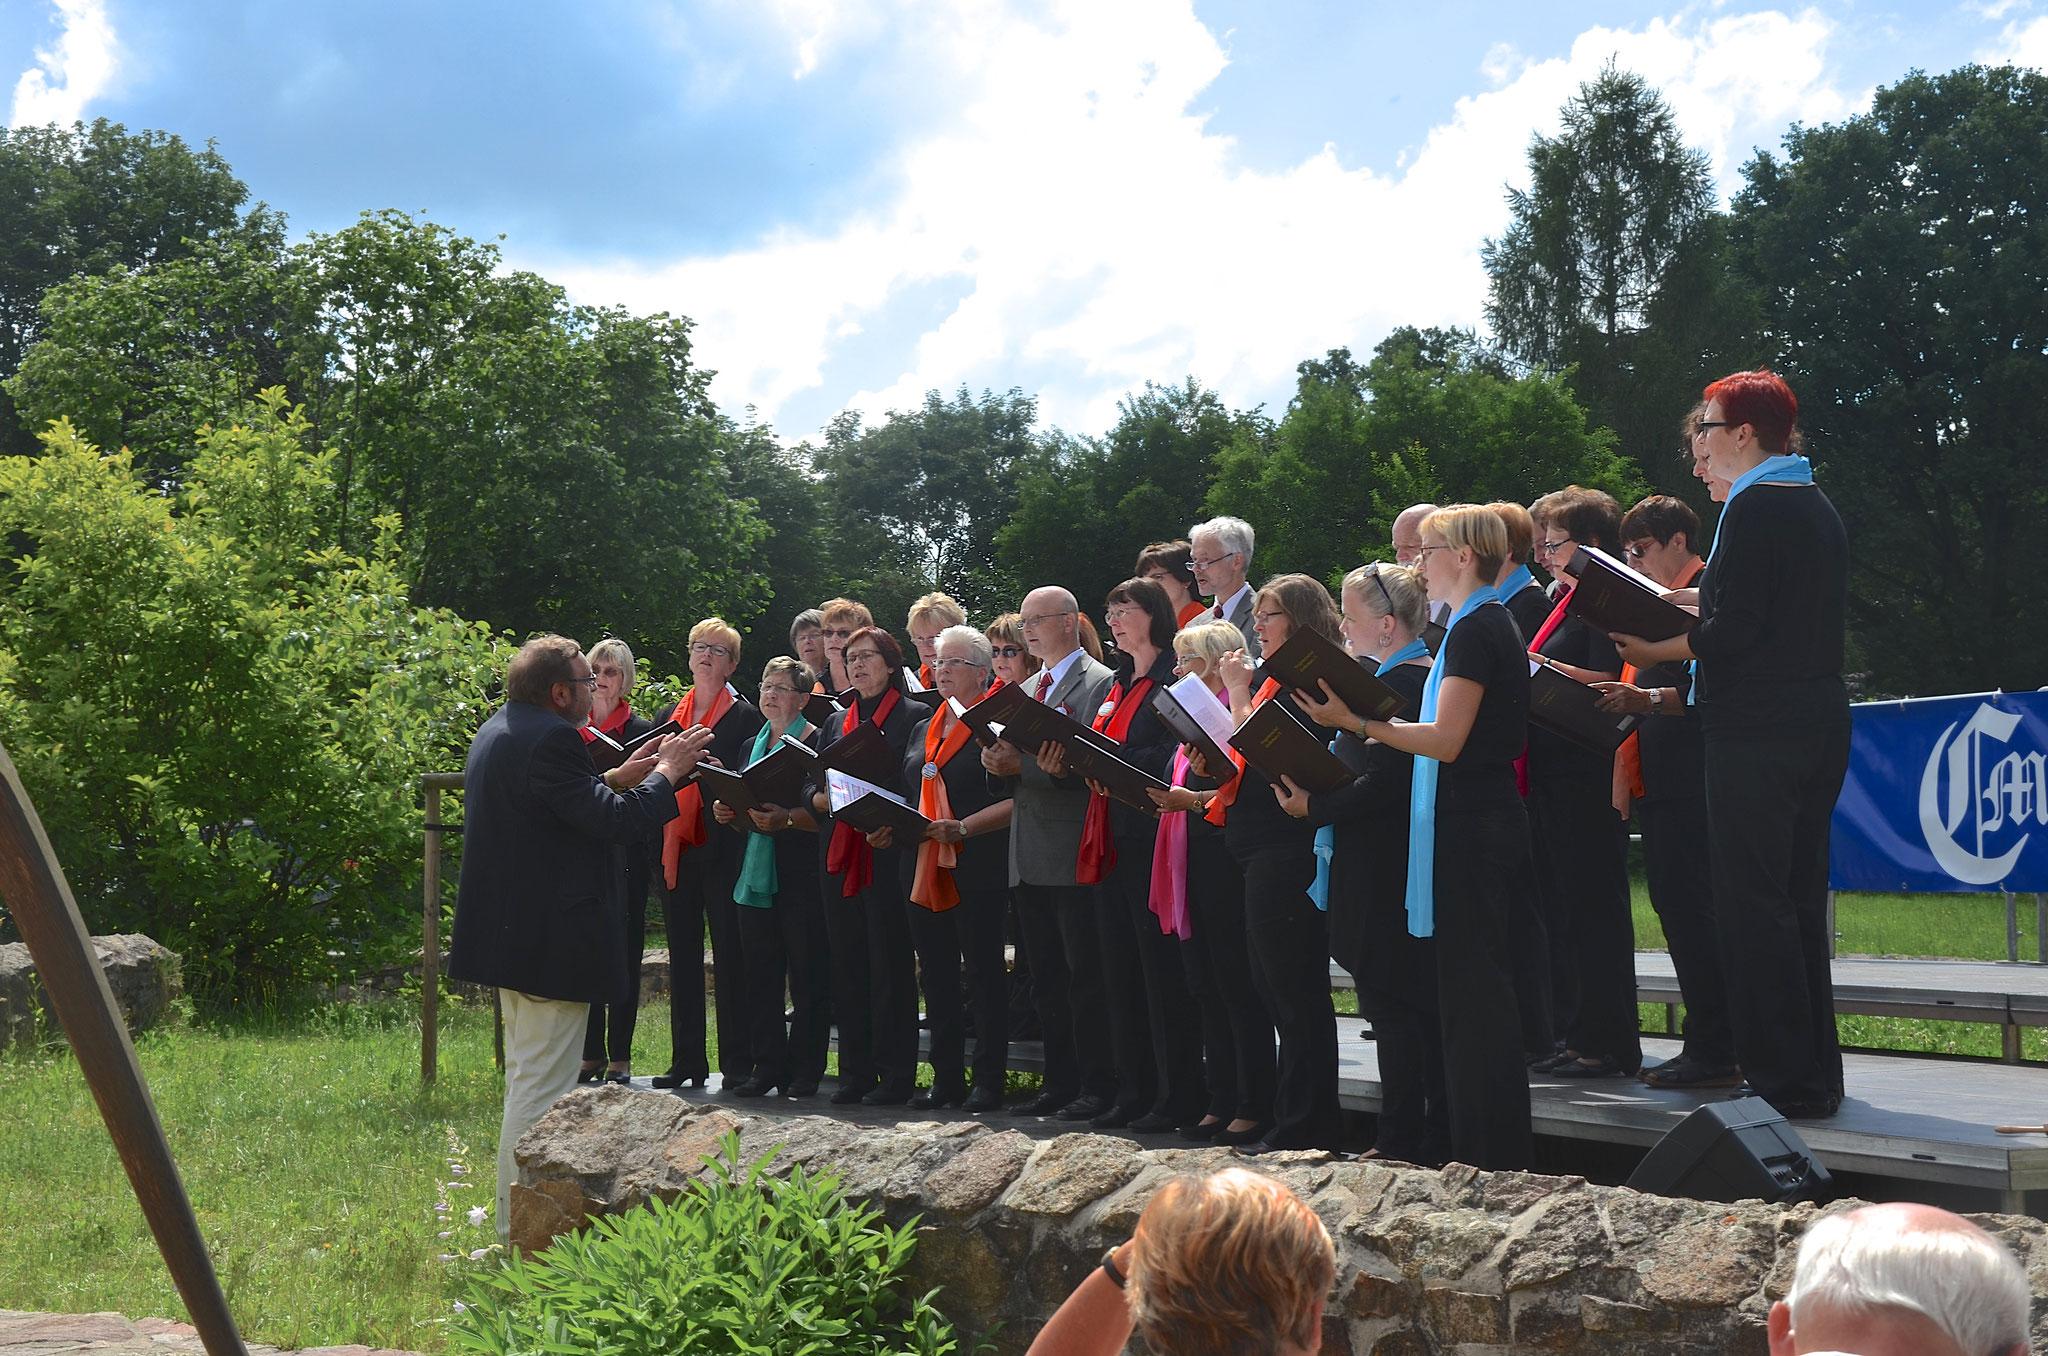 Singen vor dem Käthe-Kollwitz-Haus